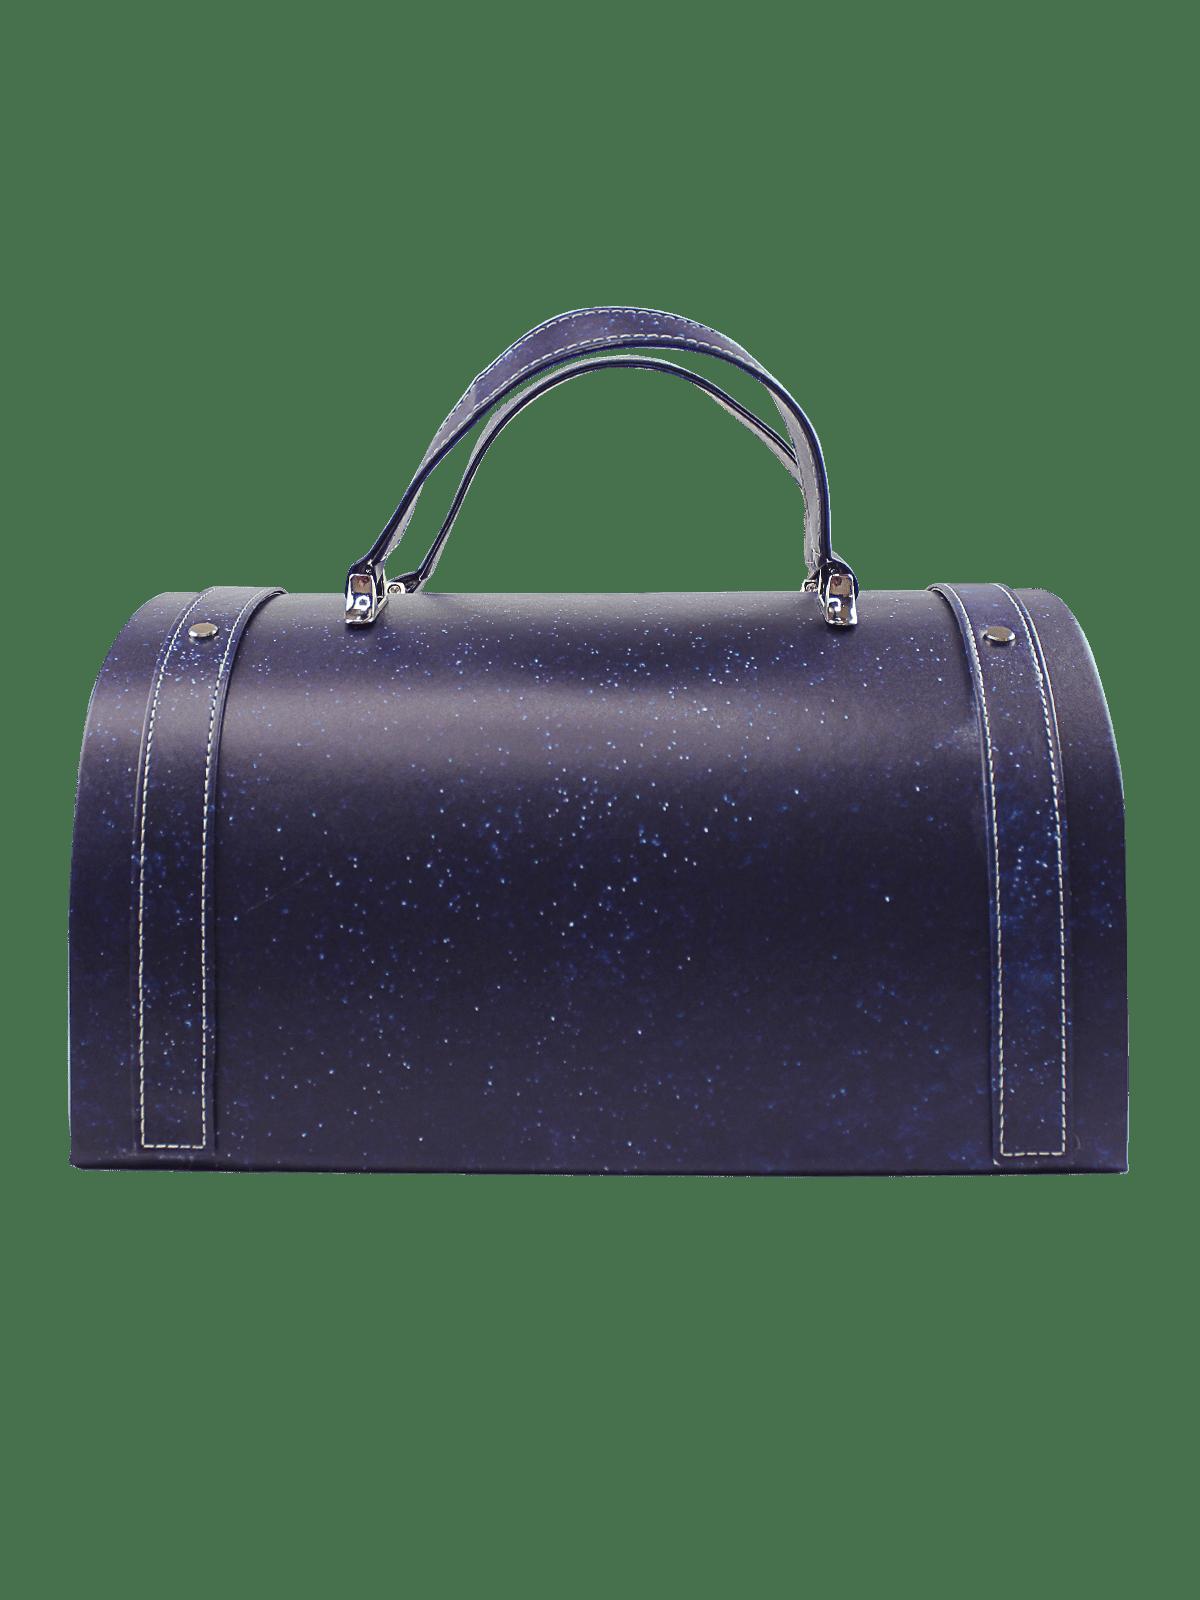 Celestolite Beauty Suitcase Front